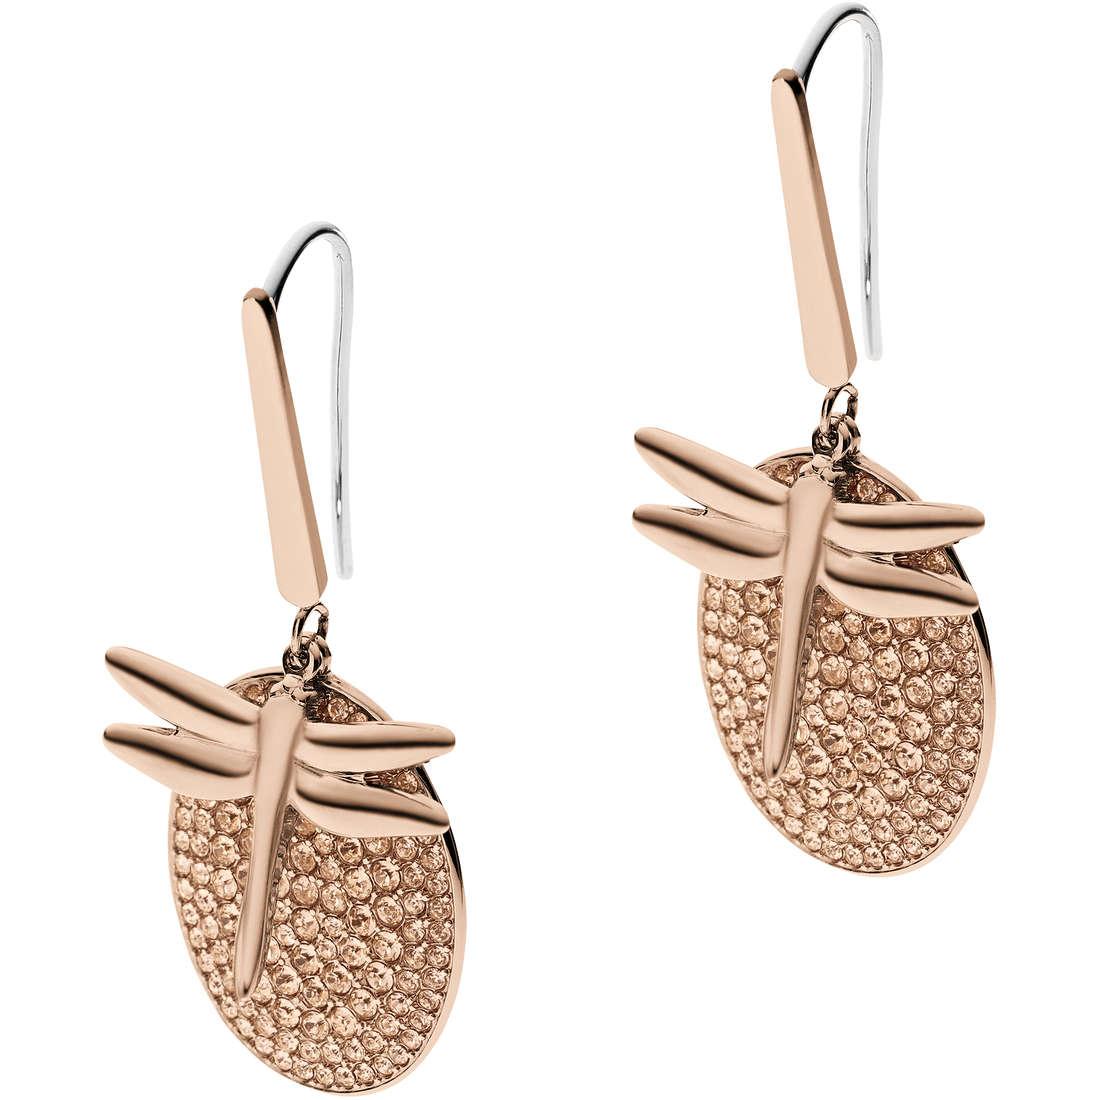 boucles d'oreille femme bijoux Emporio Armani Fall 2013 EGS1784221